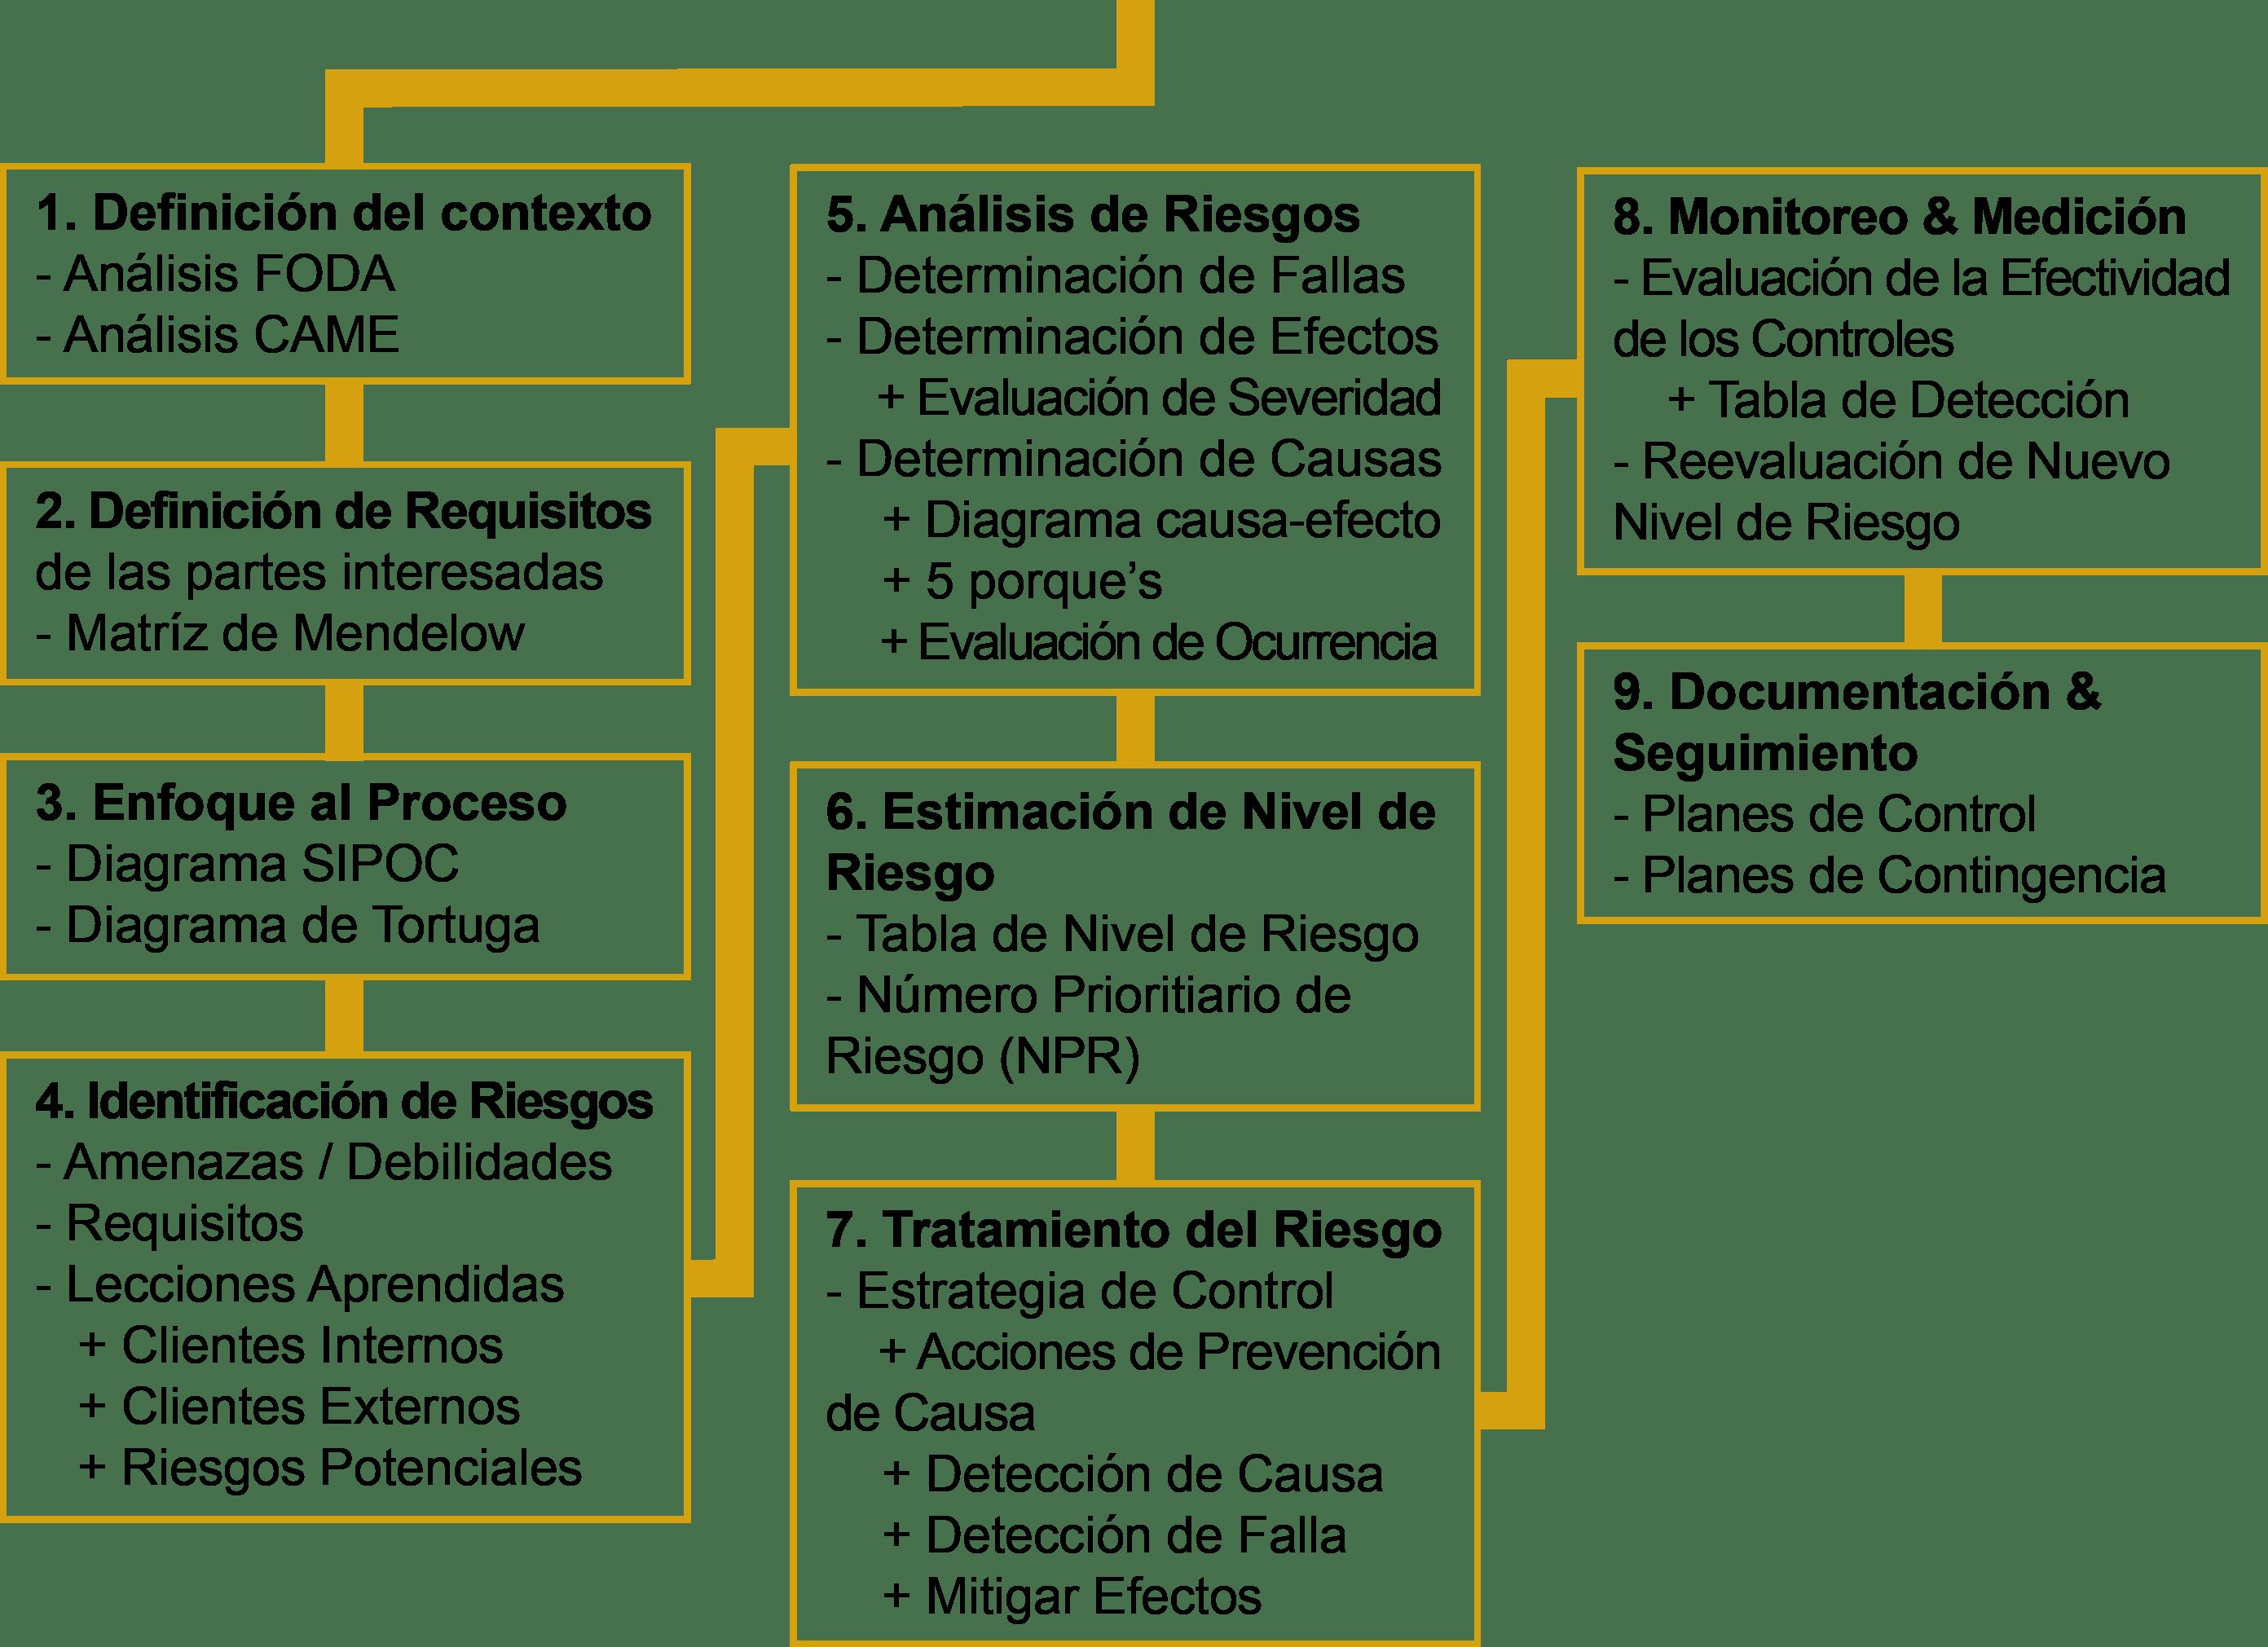 diagrama de tortuga apqp